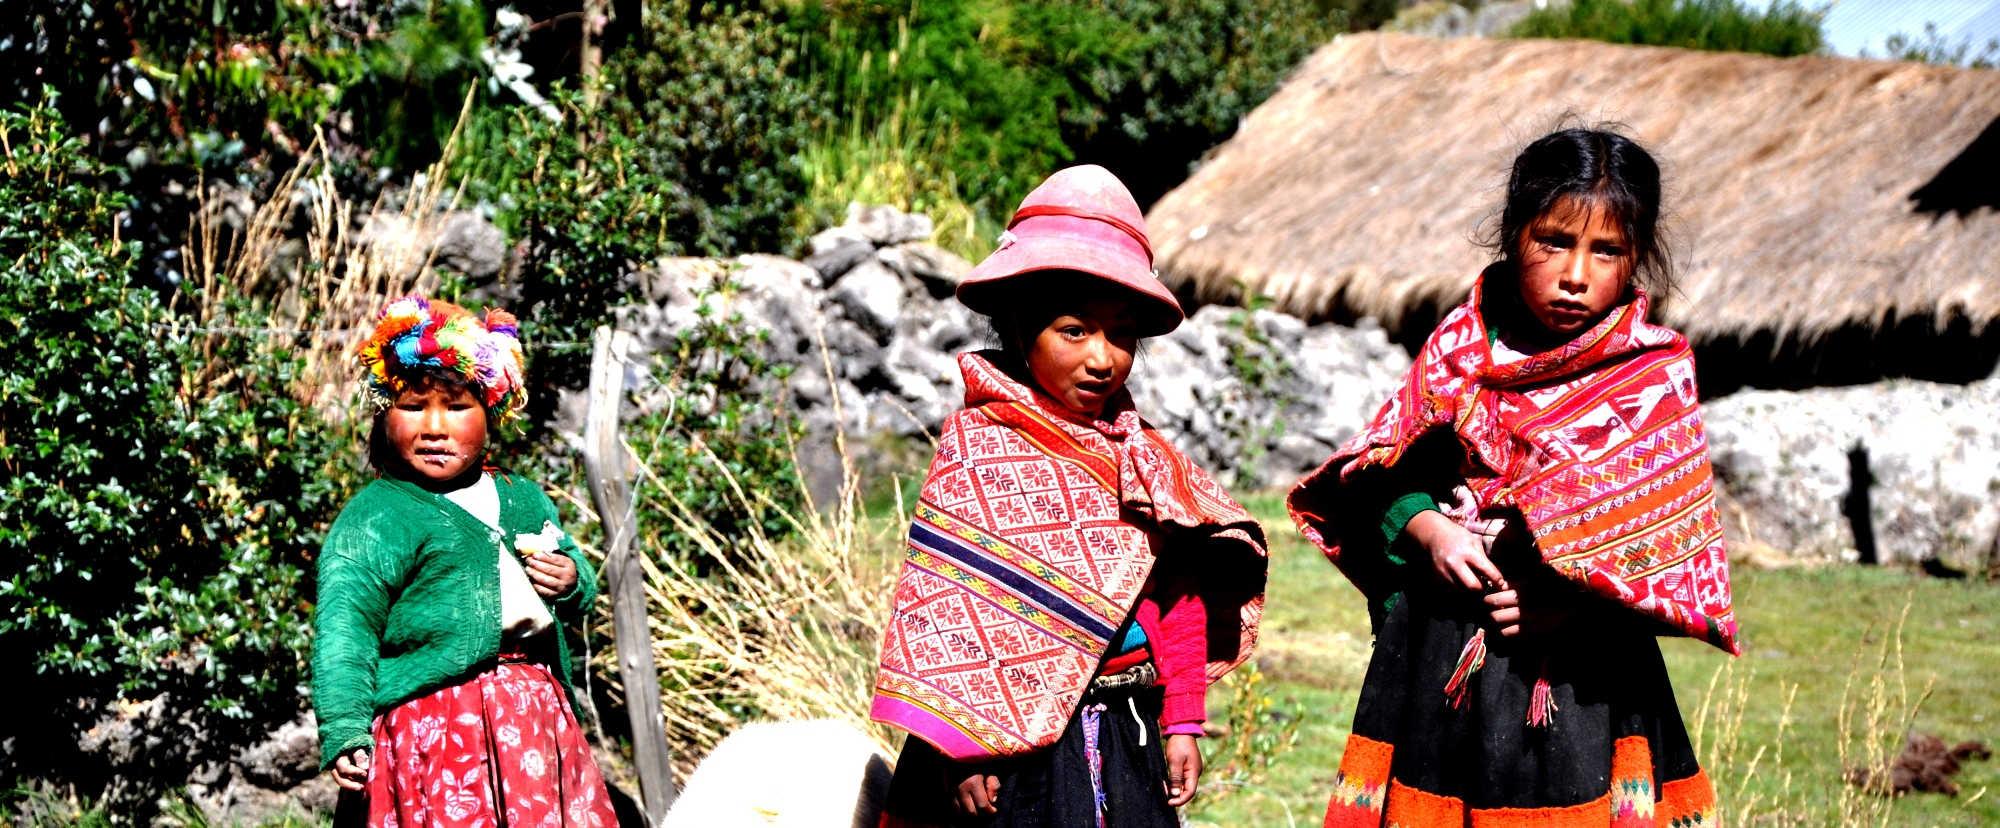 trekking in peru WILLOC yanapanakusun peruresponsabile cusco valle sagrado (1).j